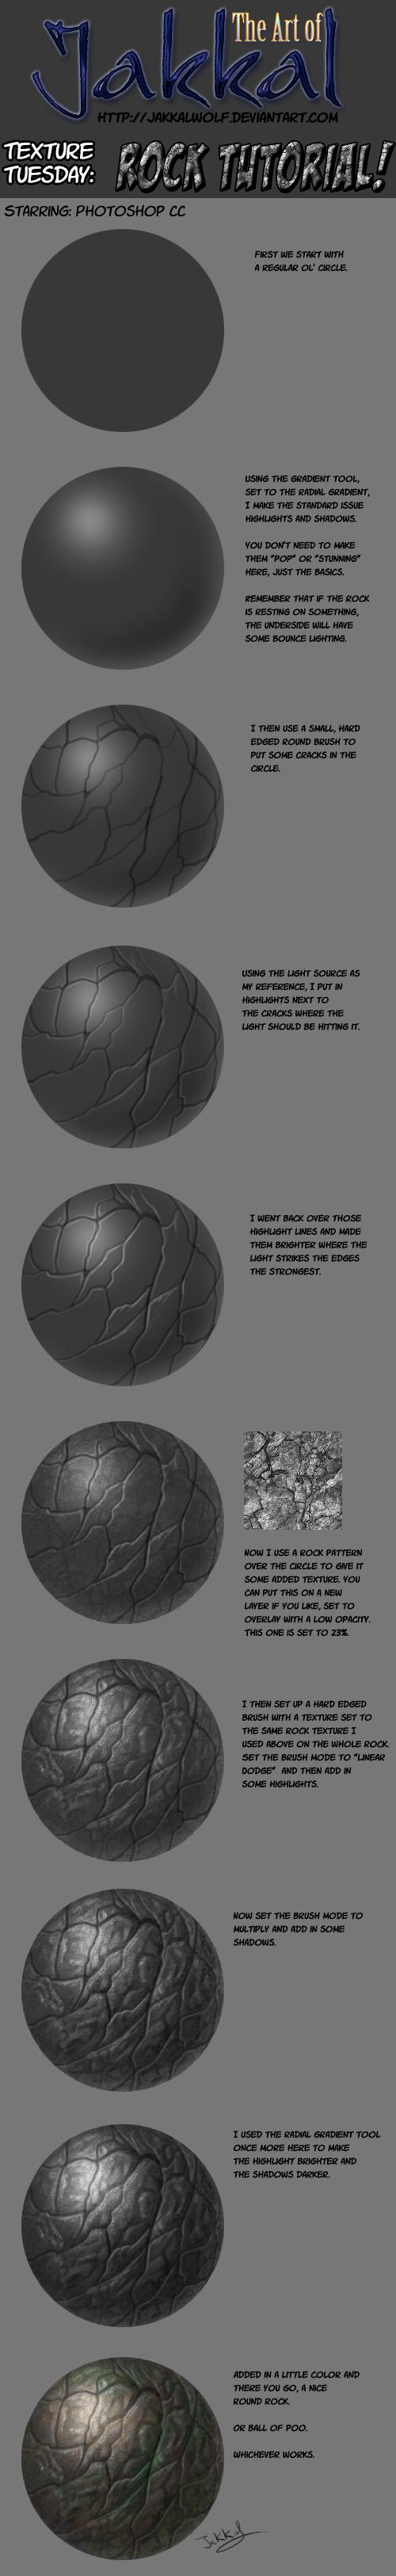 Texture Tuesday: Rock Tutorial by JakkalWolf